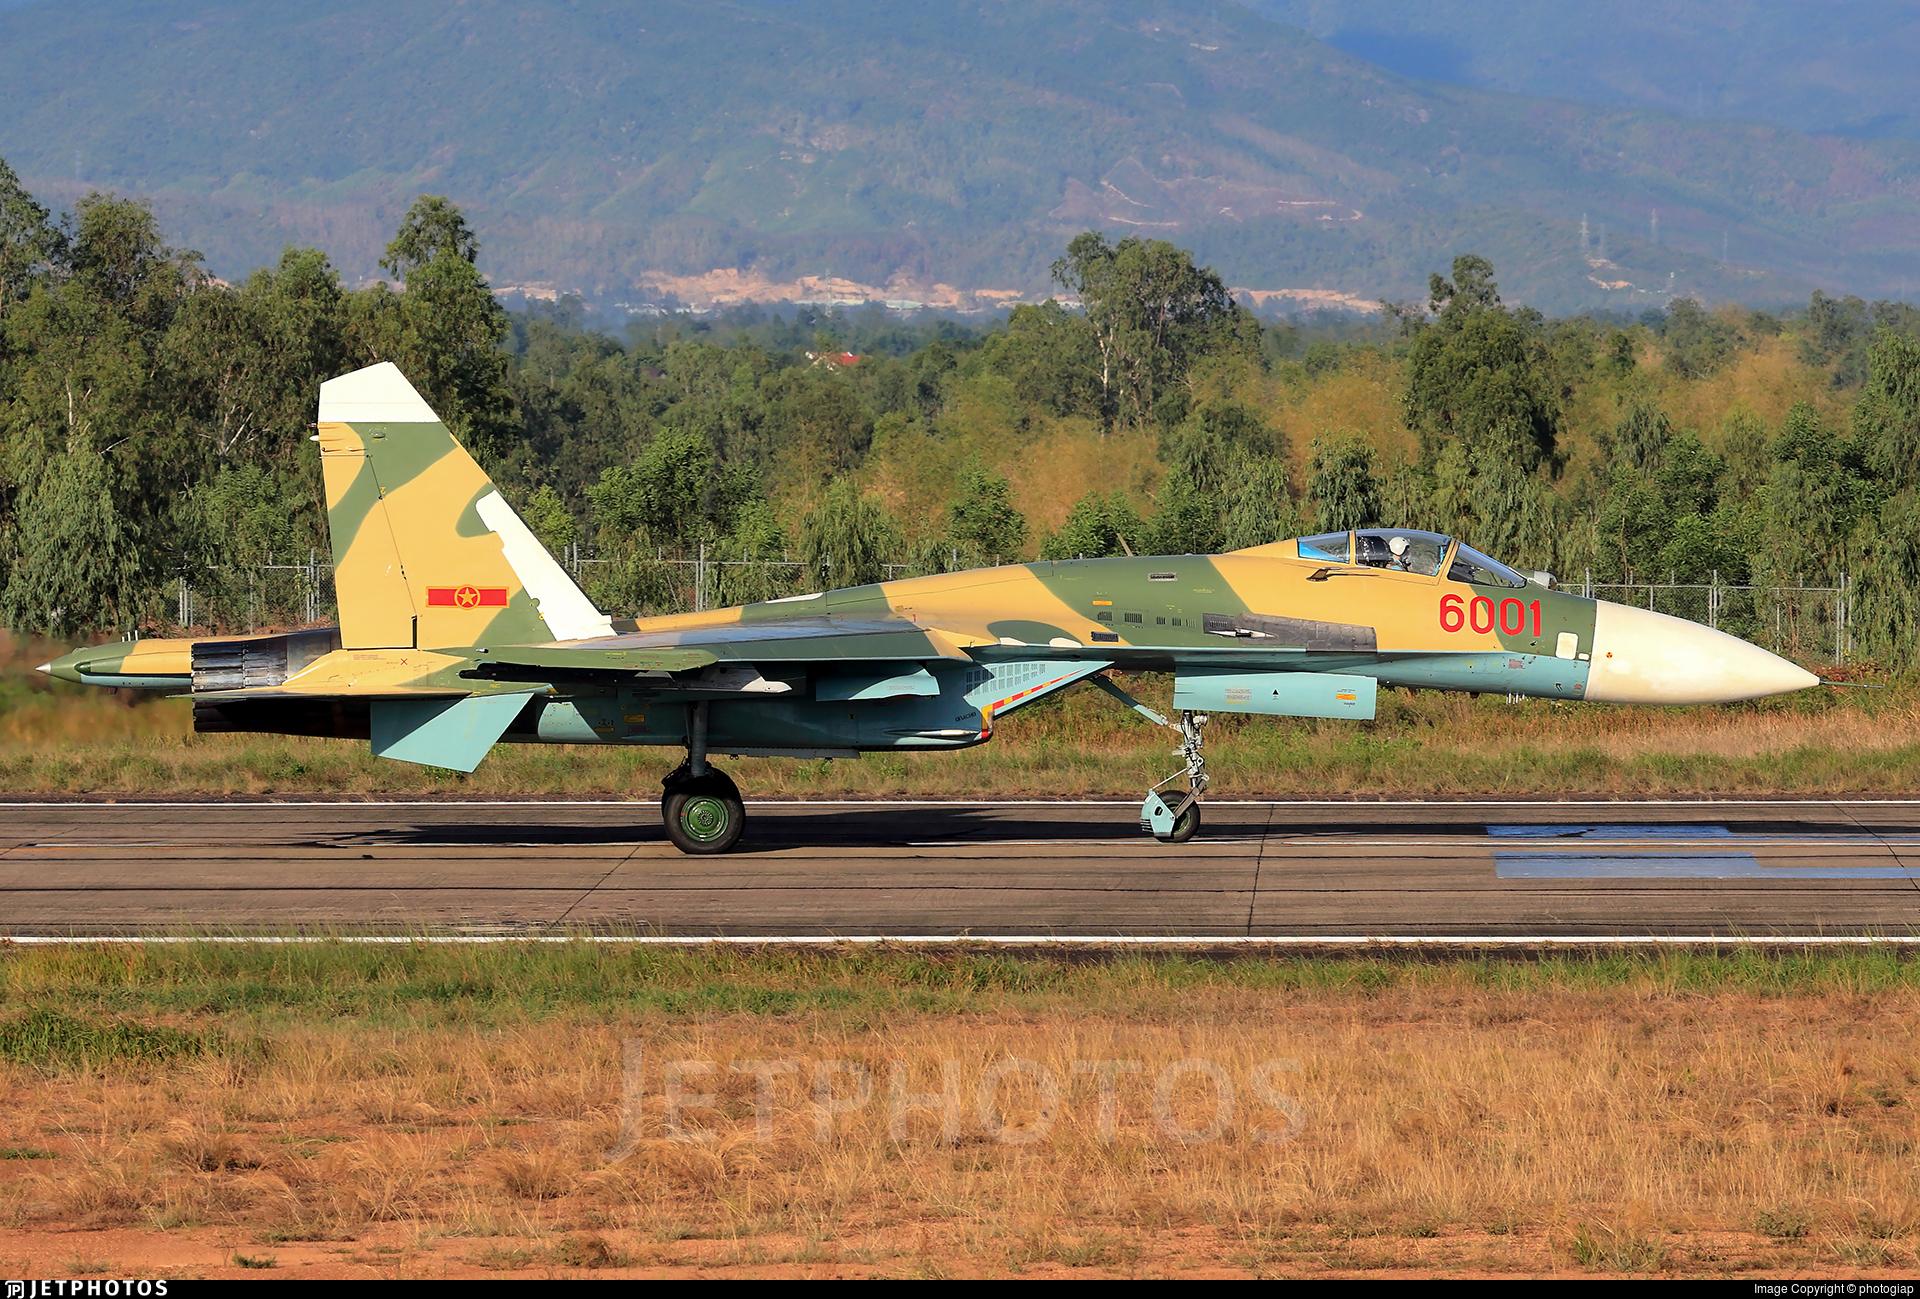 6001 - Sukhoi Su-27SK Flanker  - Vietnam - Air Force